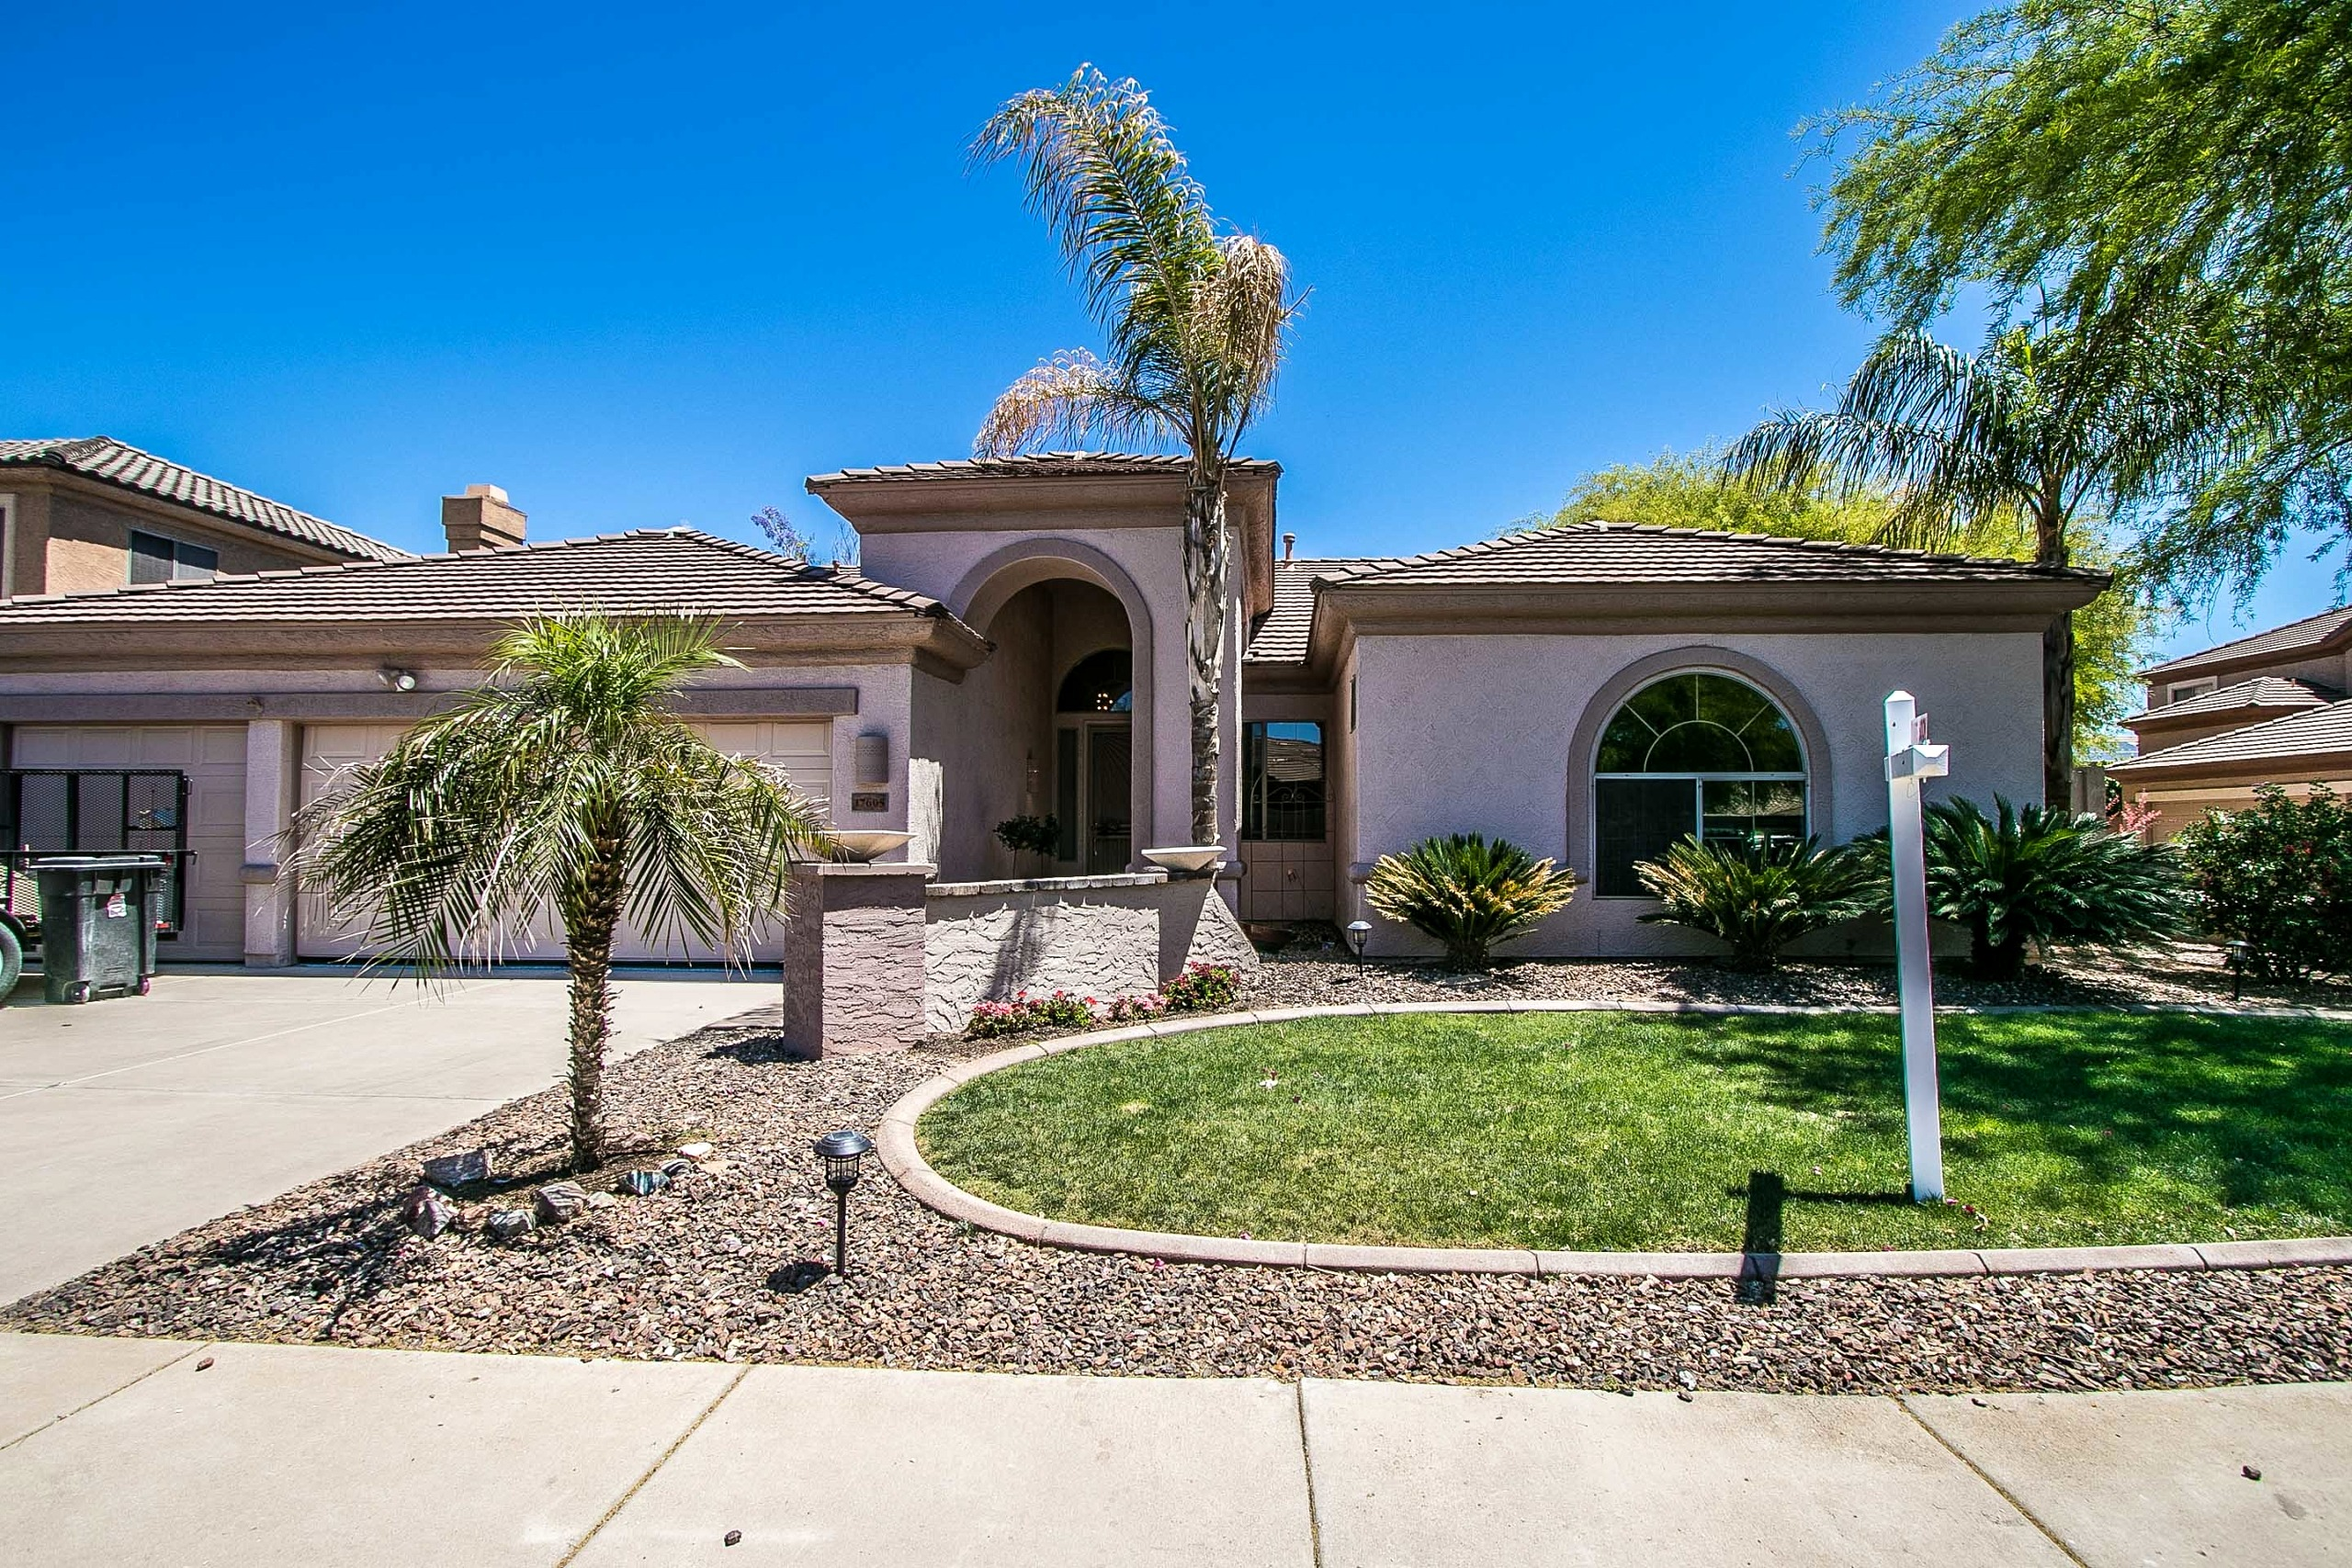 17605 N 52nd Place, Scottsdale, AZ 85254